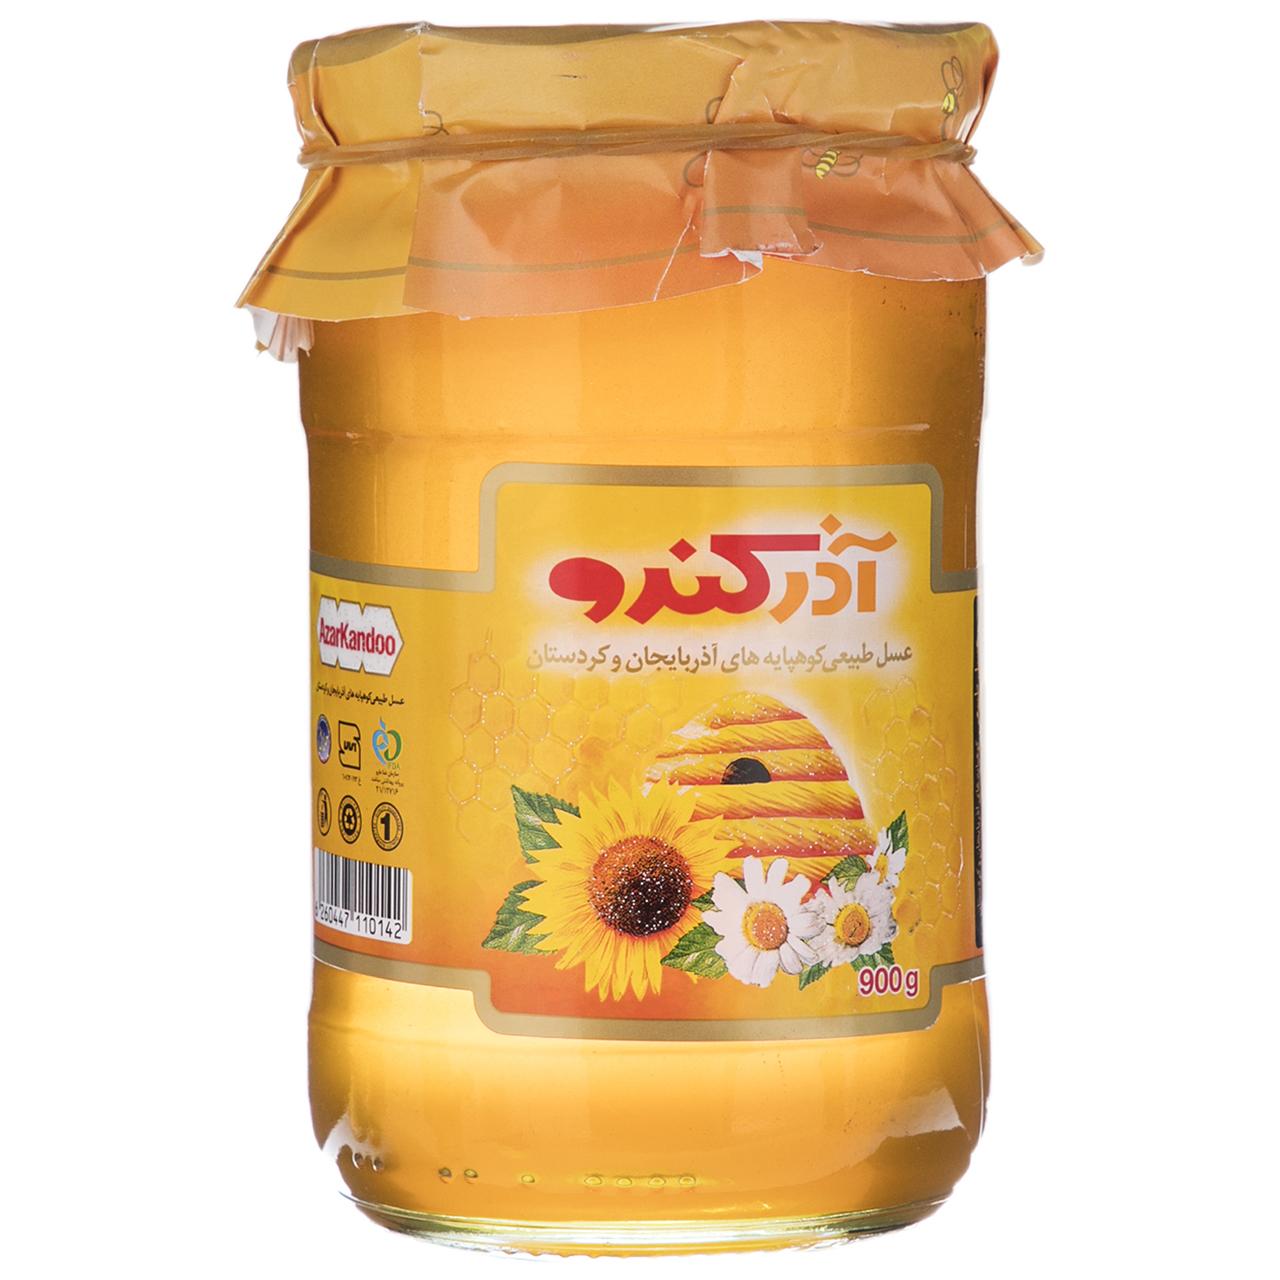 عسل طبیعی آذرکندو - 900 گرم thumb